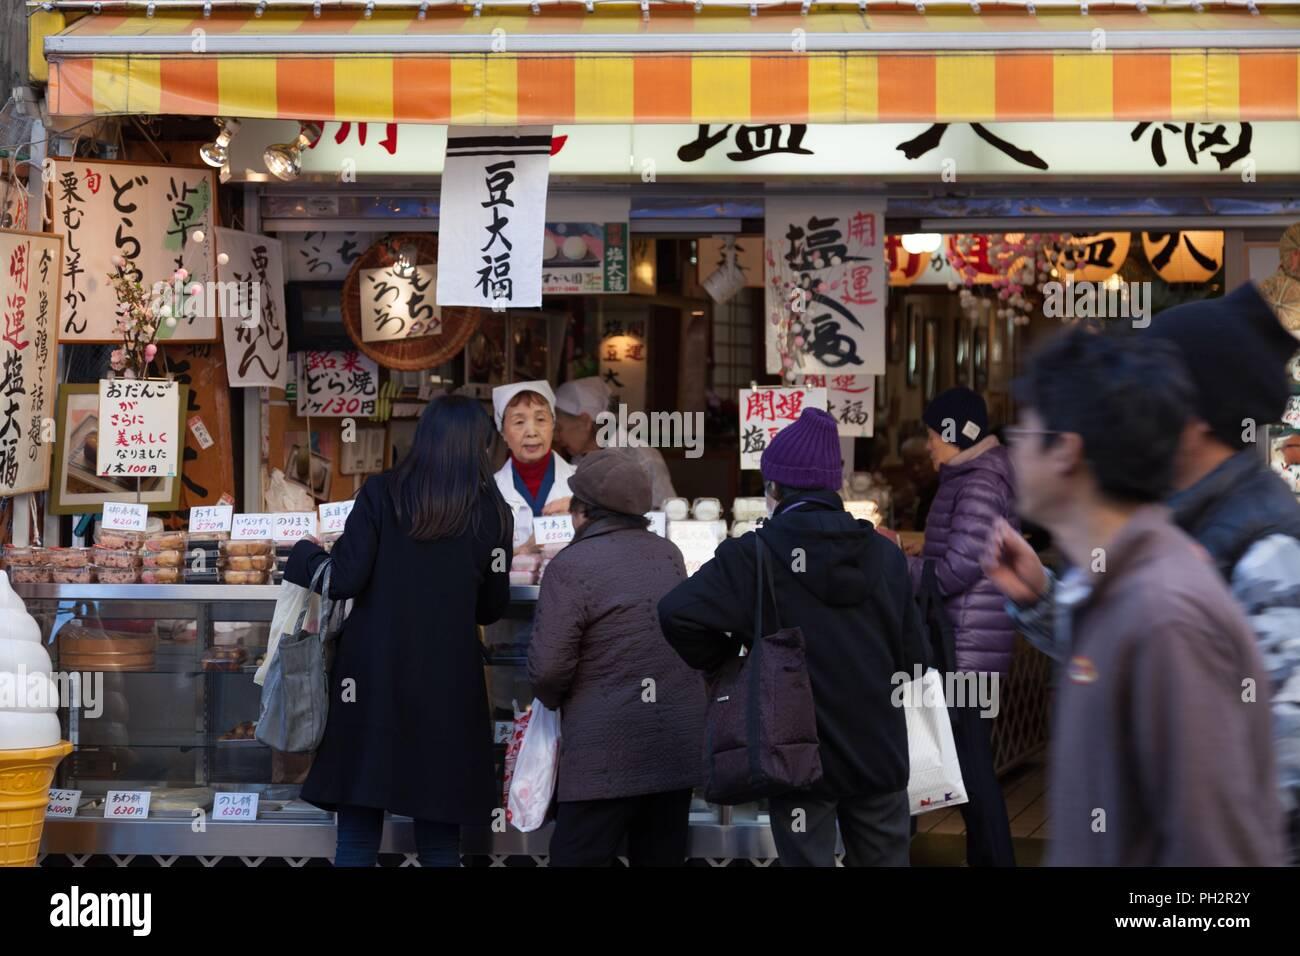 Customers waiting in line for Daifuku, a Japanese sweet, at the Jizo-Dori Shopping Street, Sugamo, Tokyo, Japan, December 13, 2017. () - Stock Image